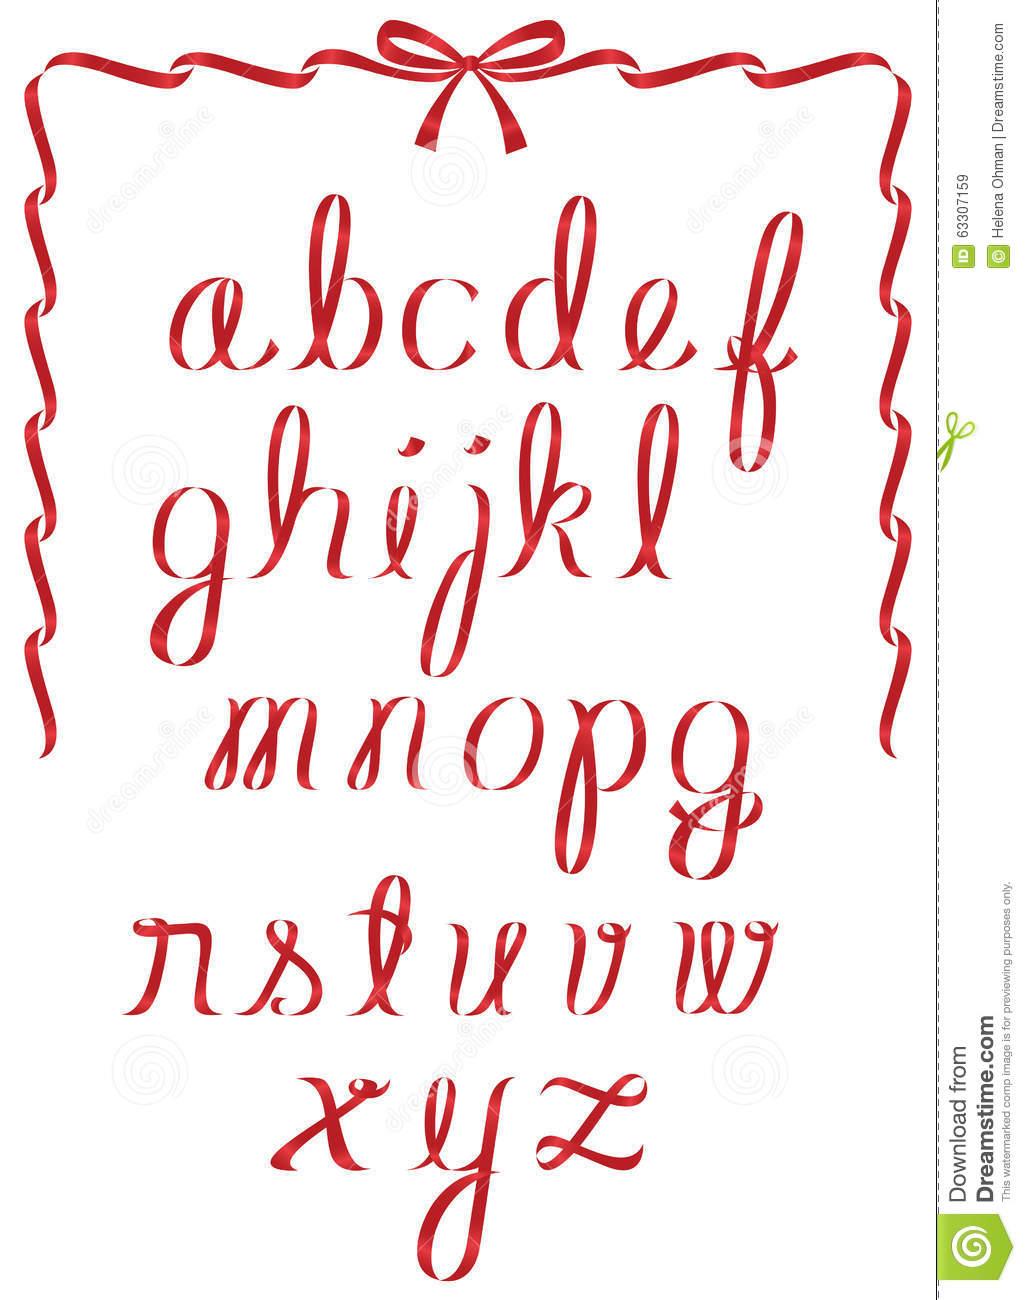 Christmas Ribbon Alphabet Stock Vector. Illustration Of Type à Alphabet Script Minuscule